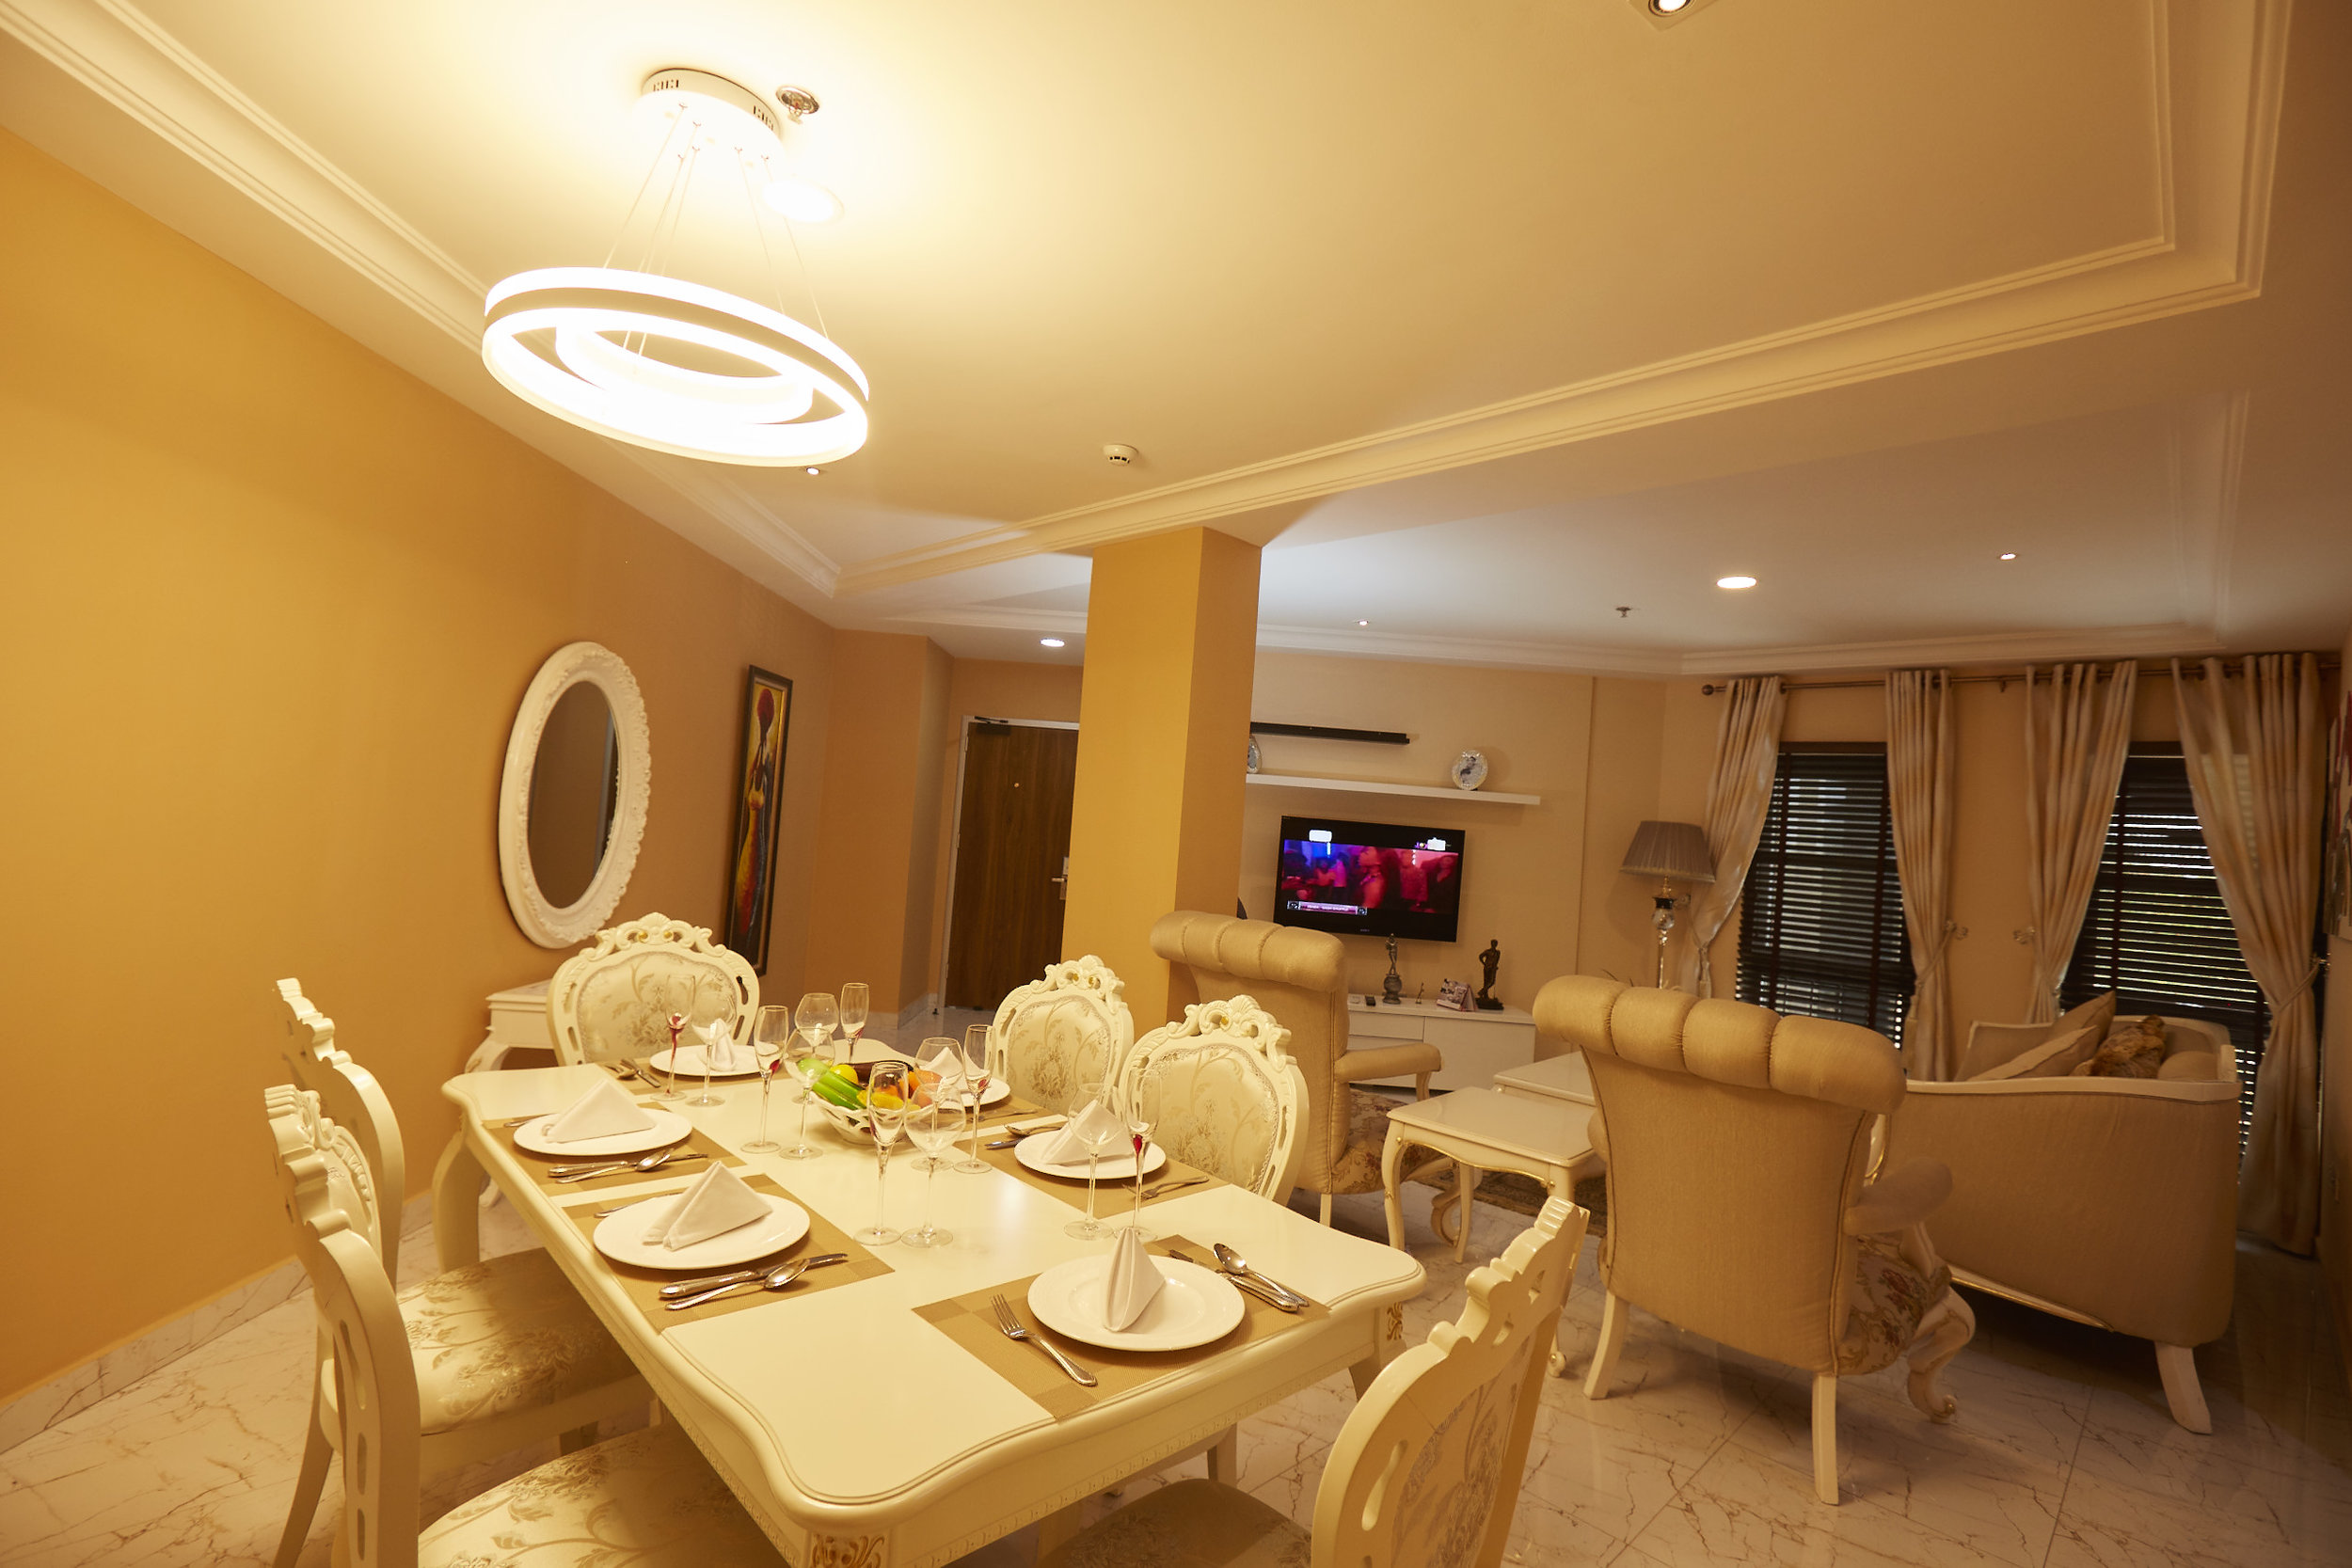 2 Bed Royale Dining Room 4.jpg